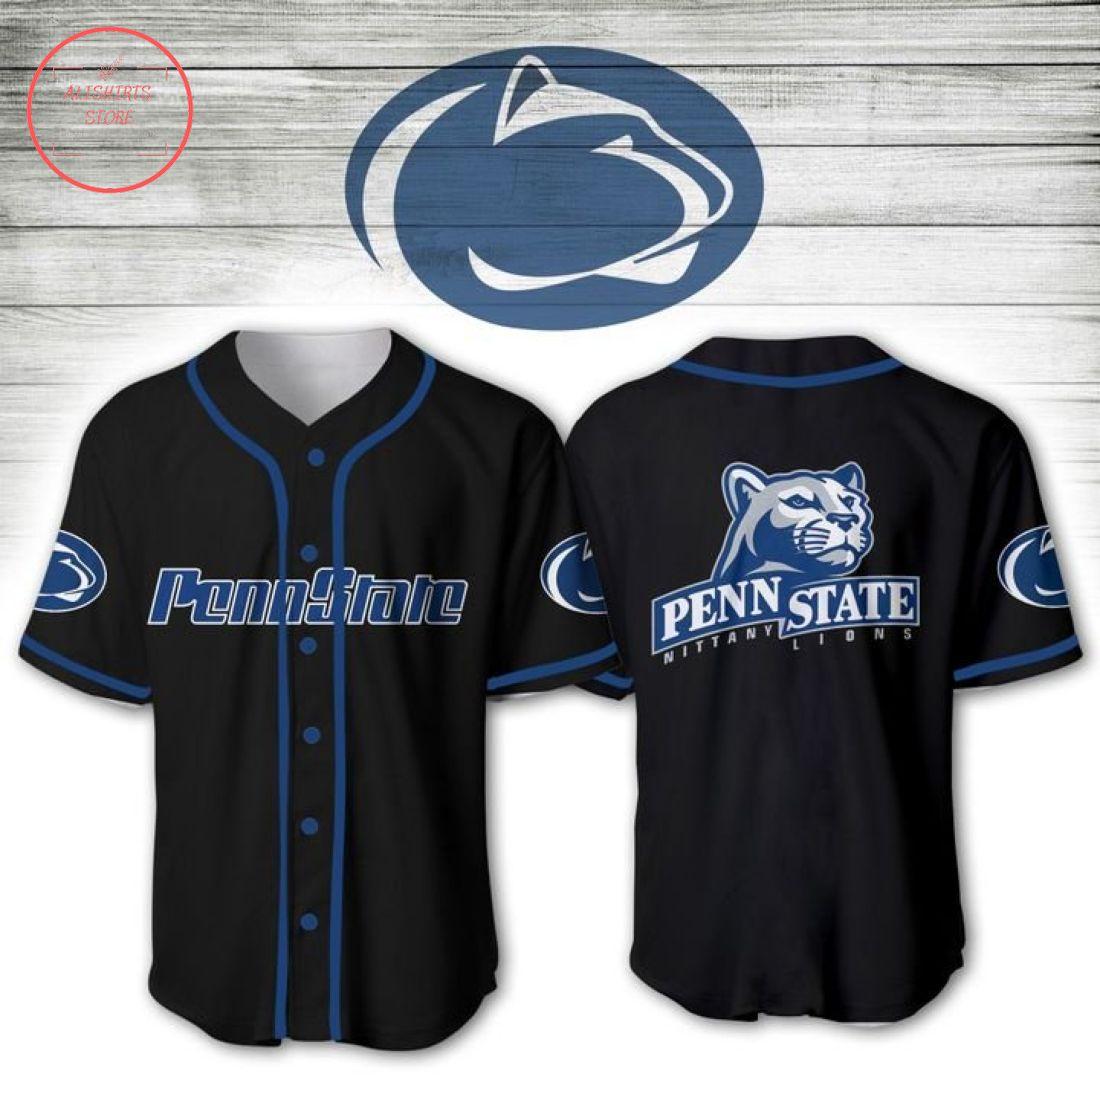 Penn State Nittany Lions NCAA Baseball Jersey